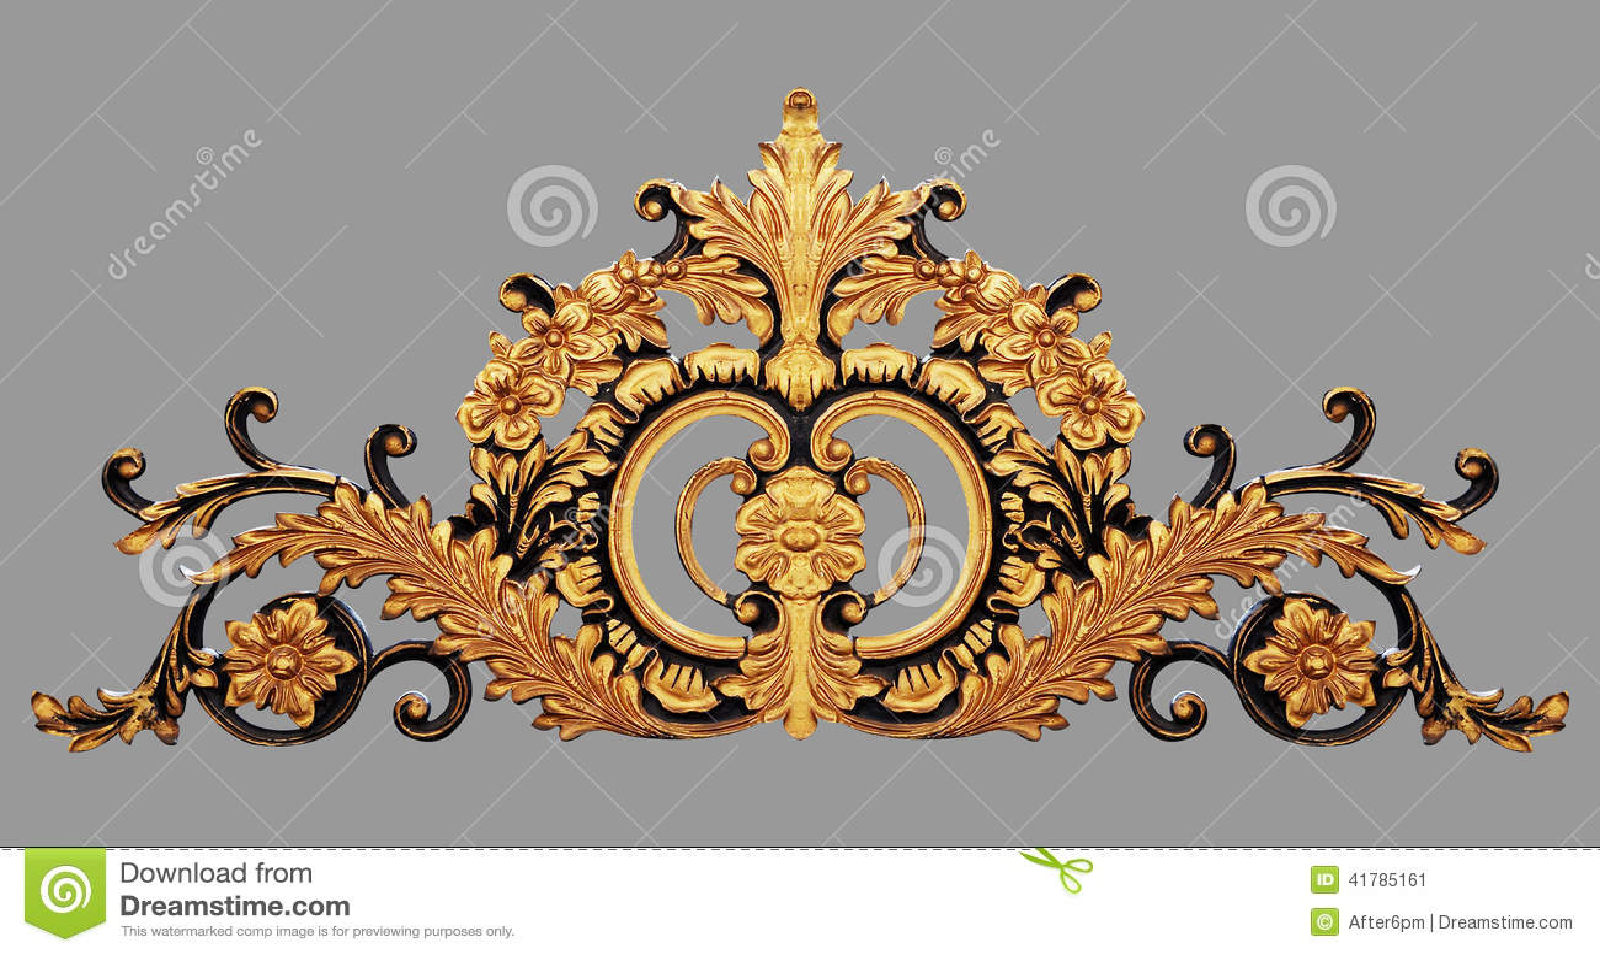 Ornament elements, vintage gold floral